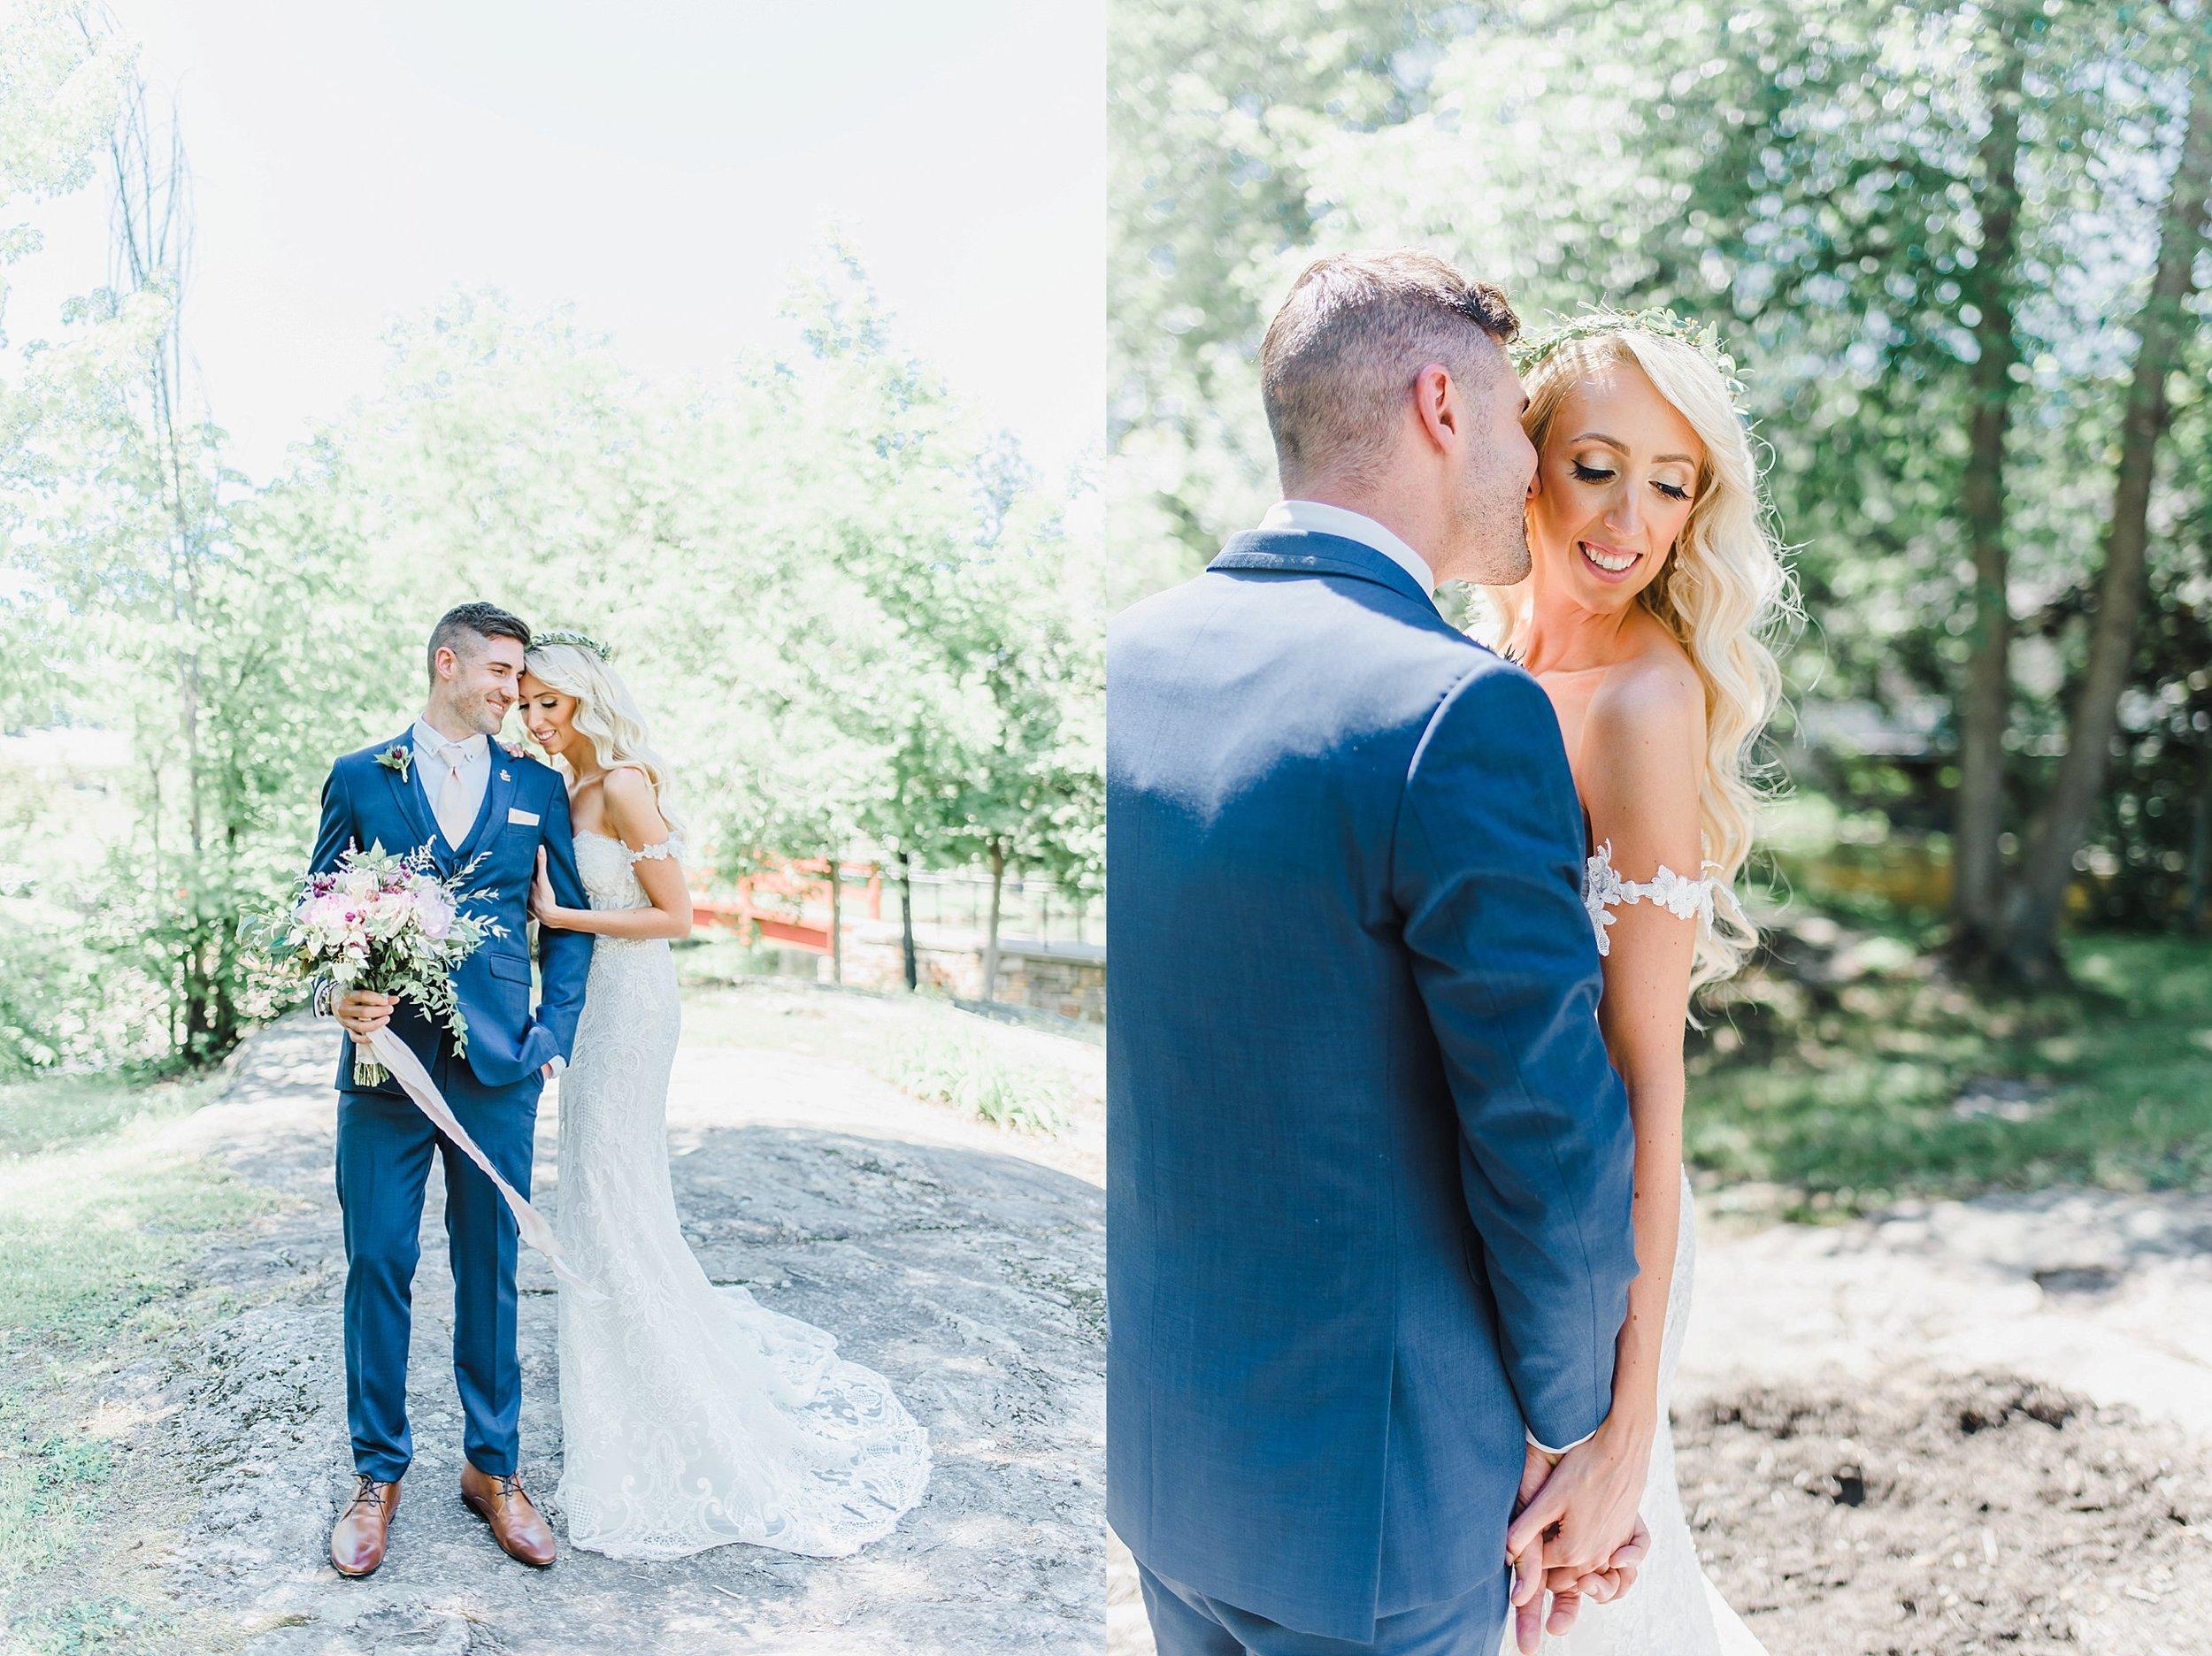 light airy indie fine art ottawa wedding photographer | Ali and Batoul Photography_0048.jpg